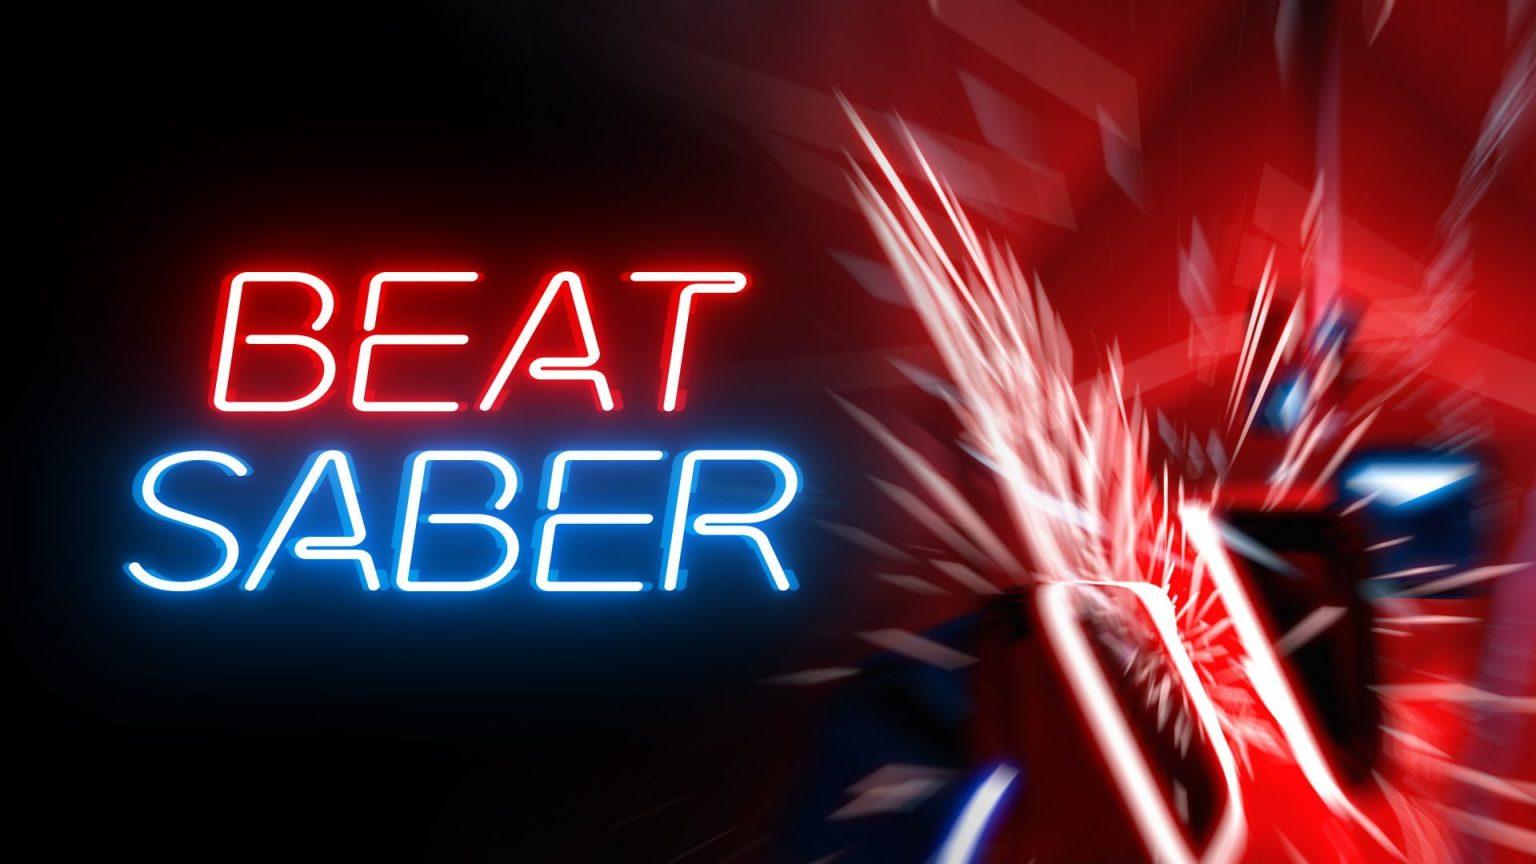 Beat Saber PS4 iOS/APK Full Version Free Download